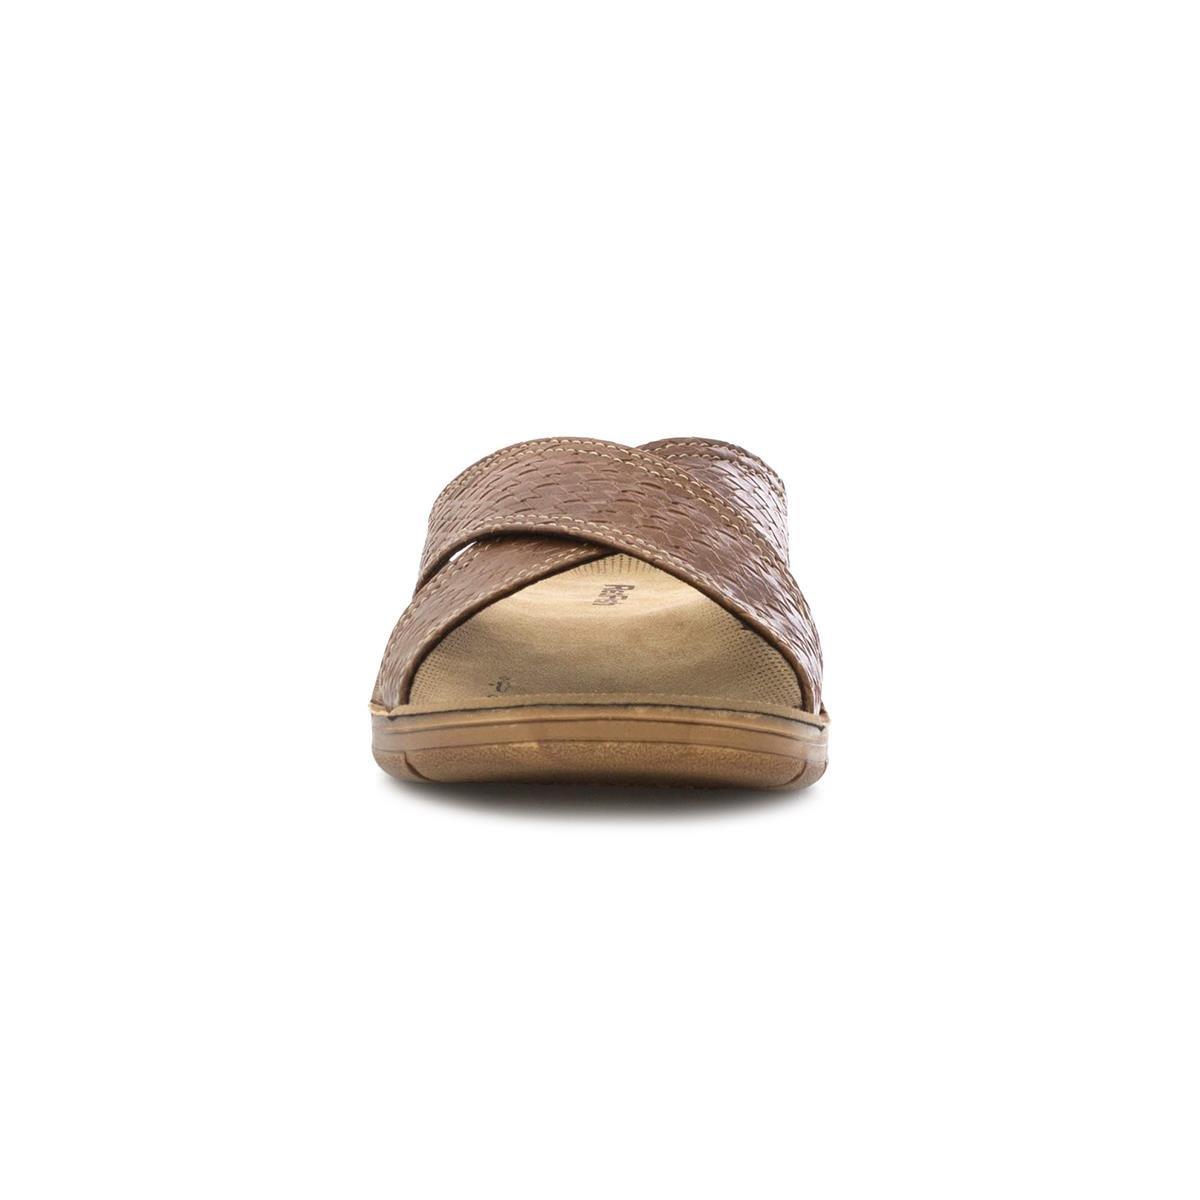 5c8d3cff36f Red Fish Mens Tan Woven Cross Strap Mule  Amazon.co.uk  Shoes   Bags